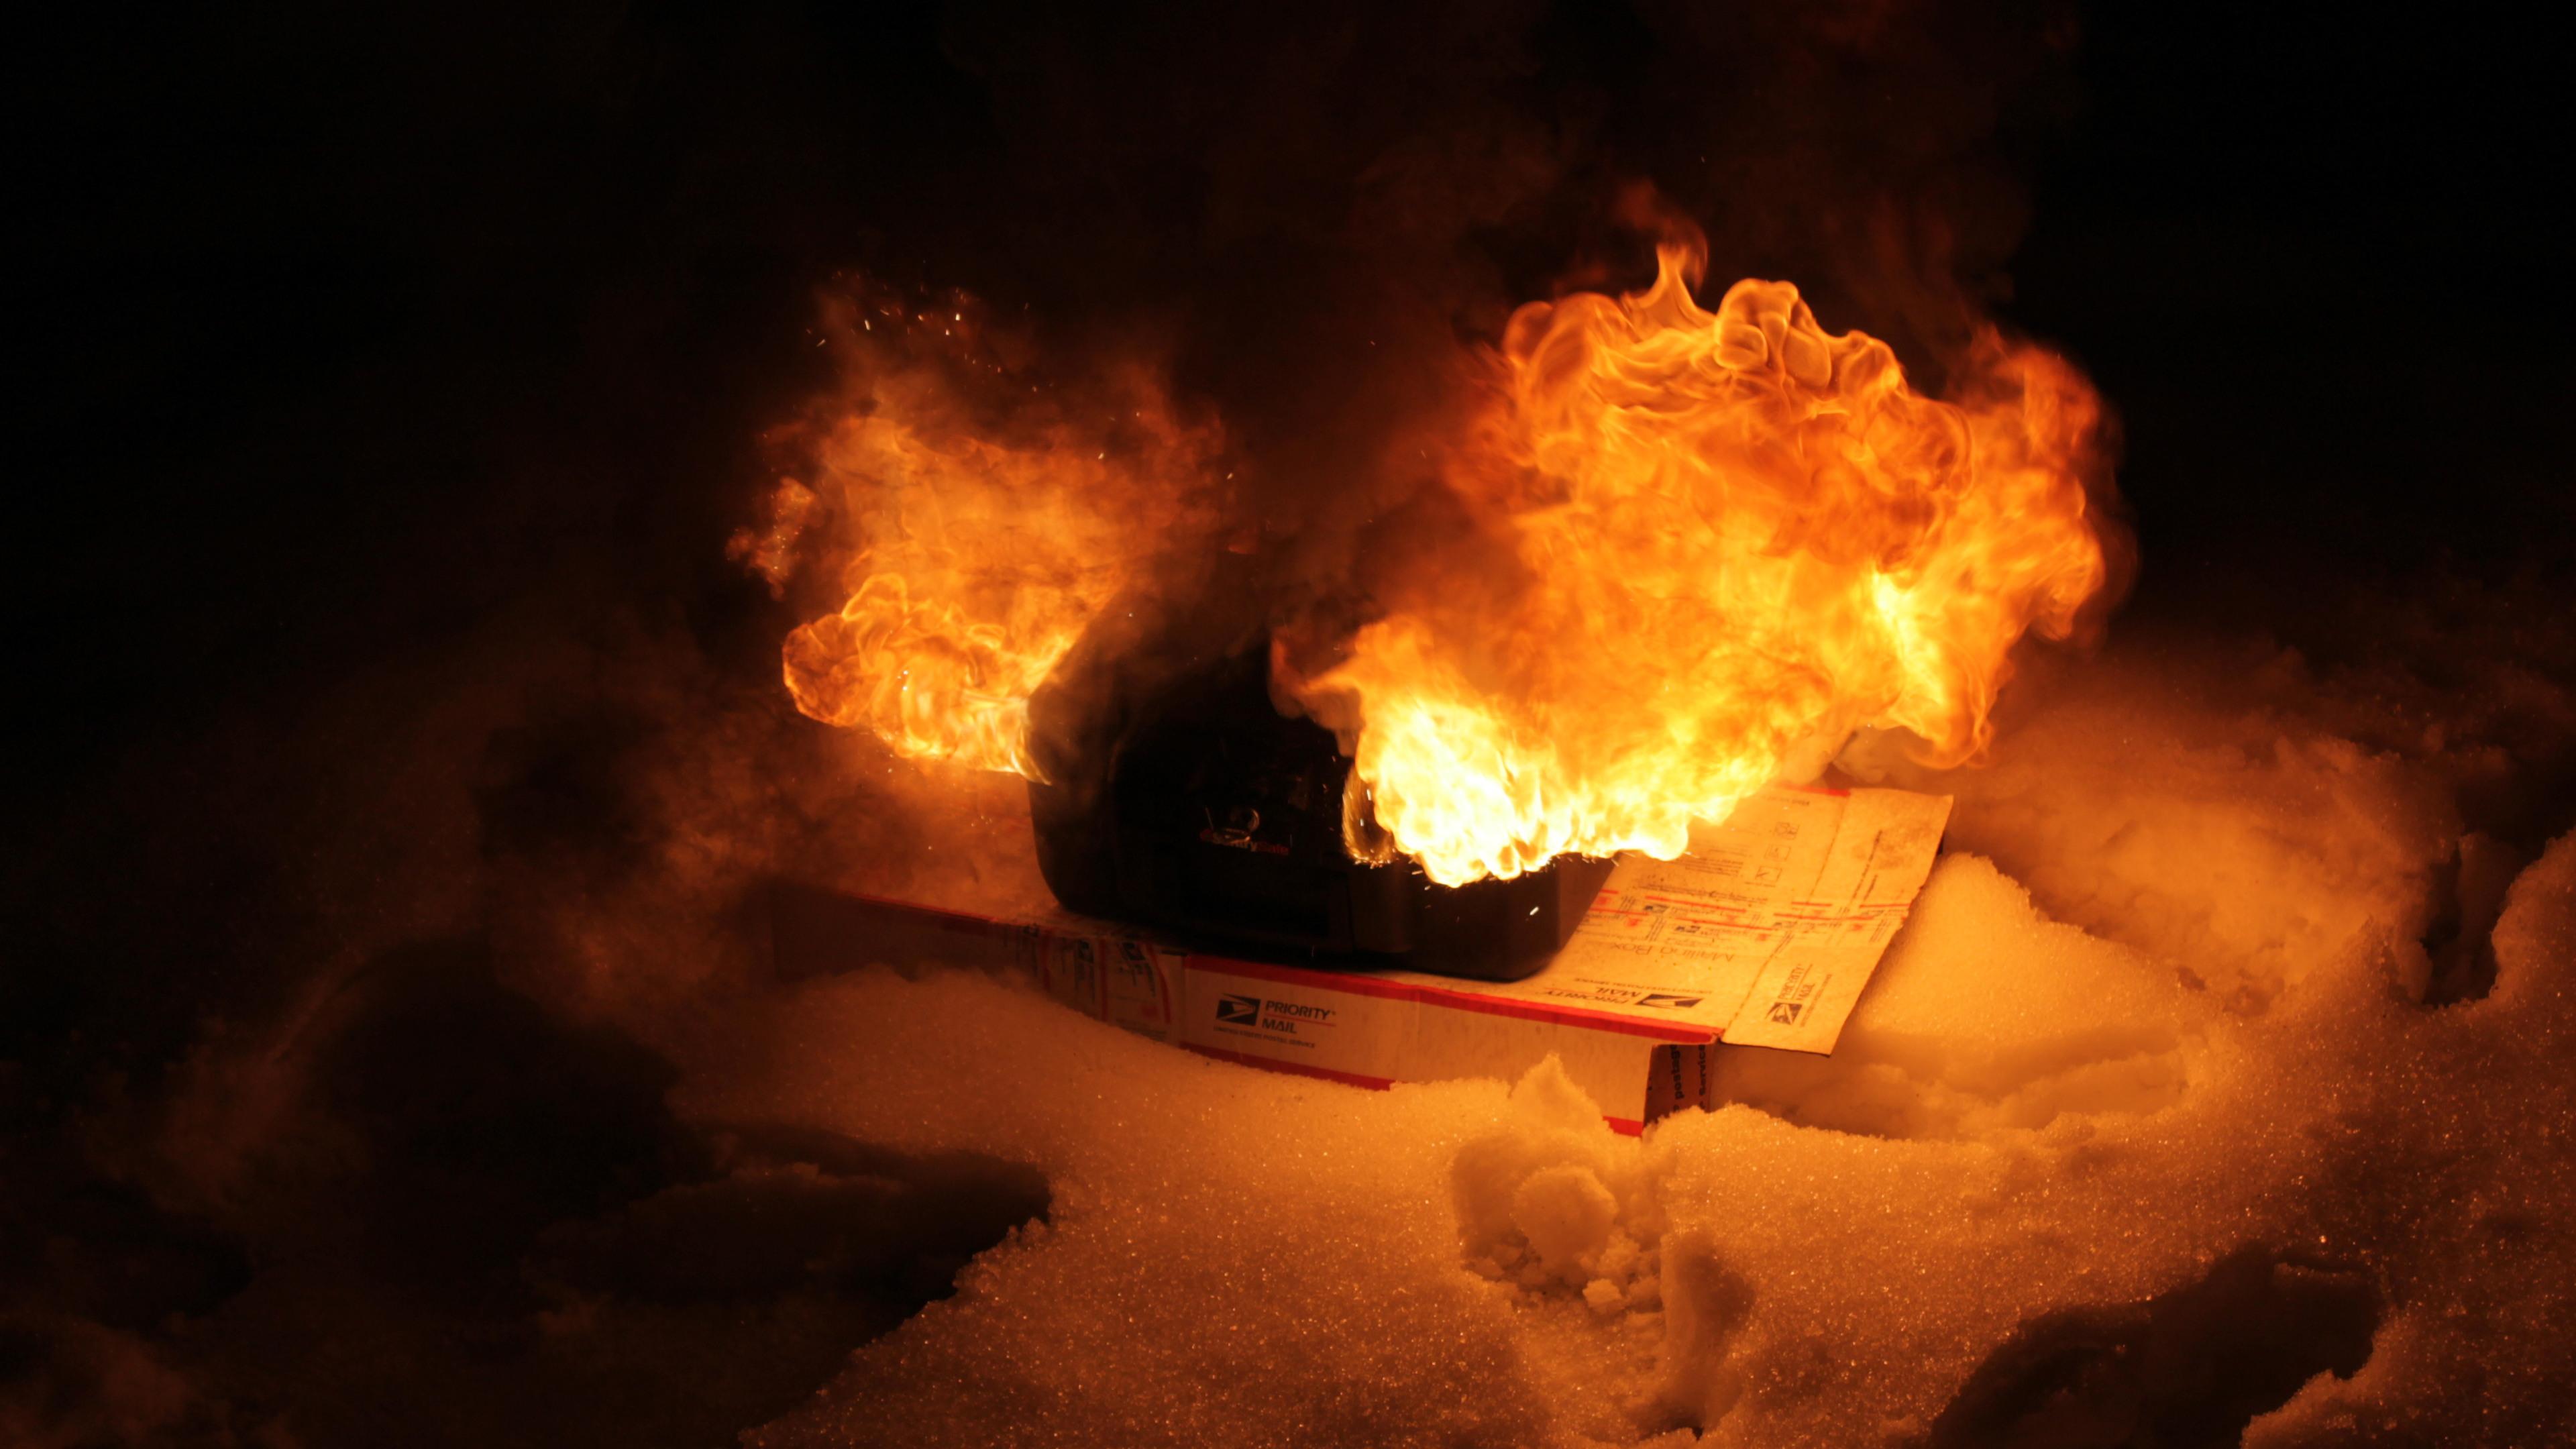 BOTPOST [BOTPOST] Testingtestingnice Flames [3840x2160] i 3840x2160